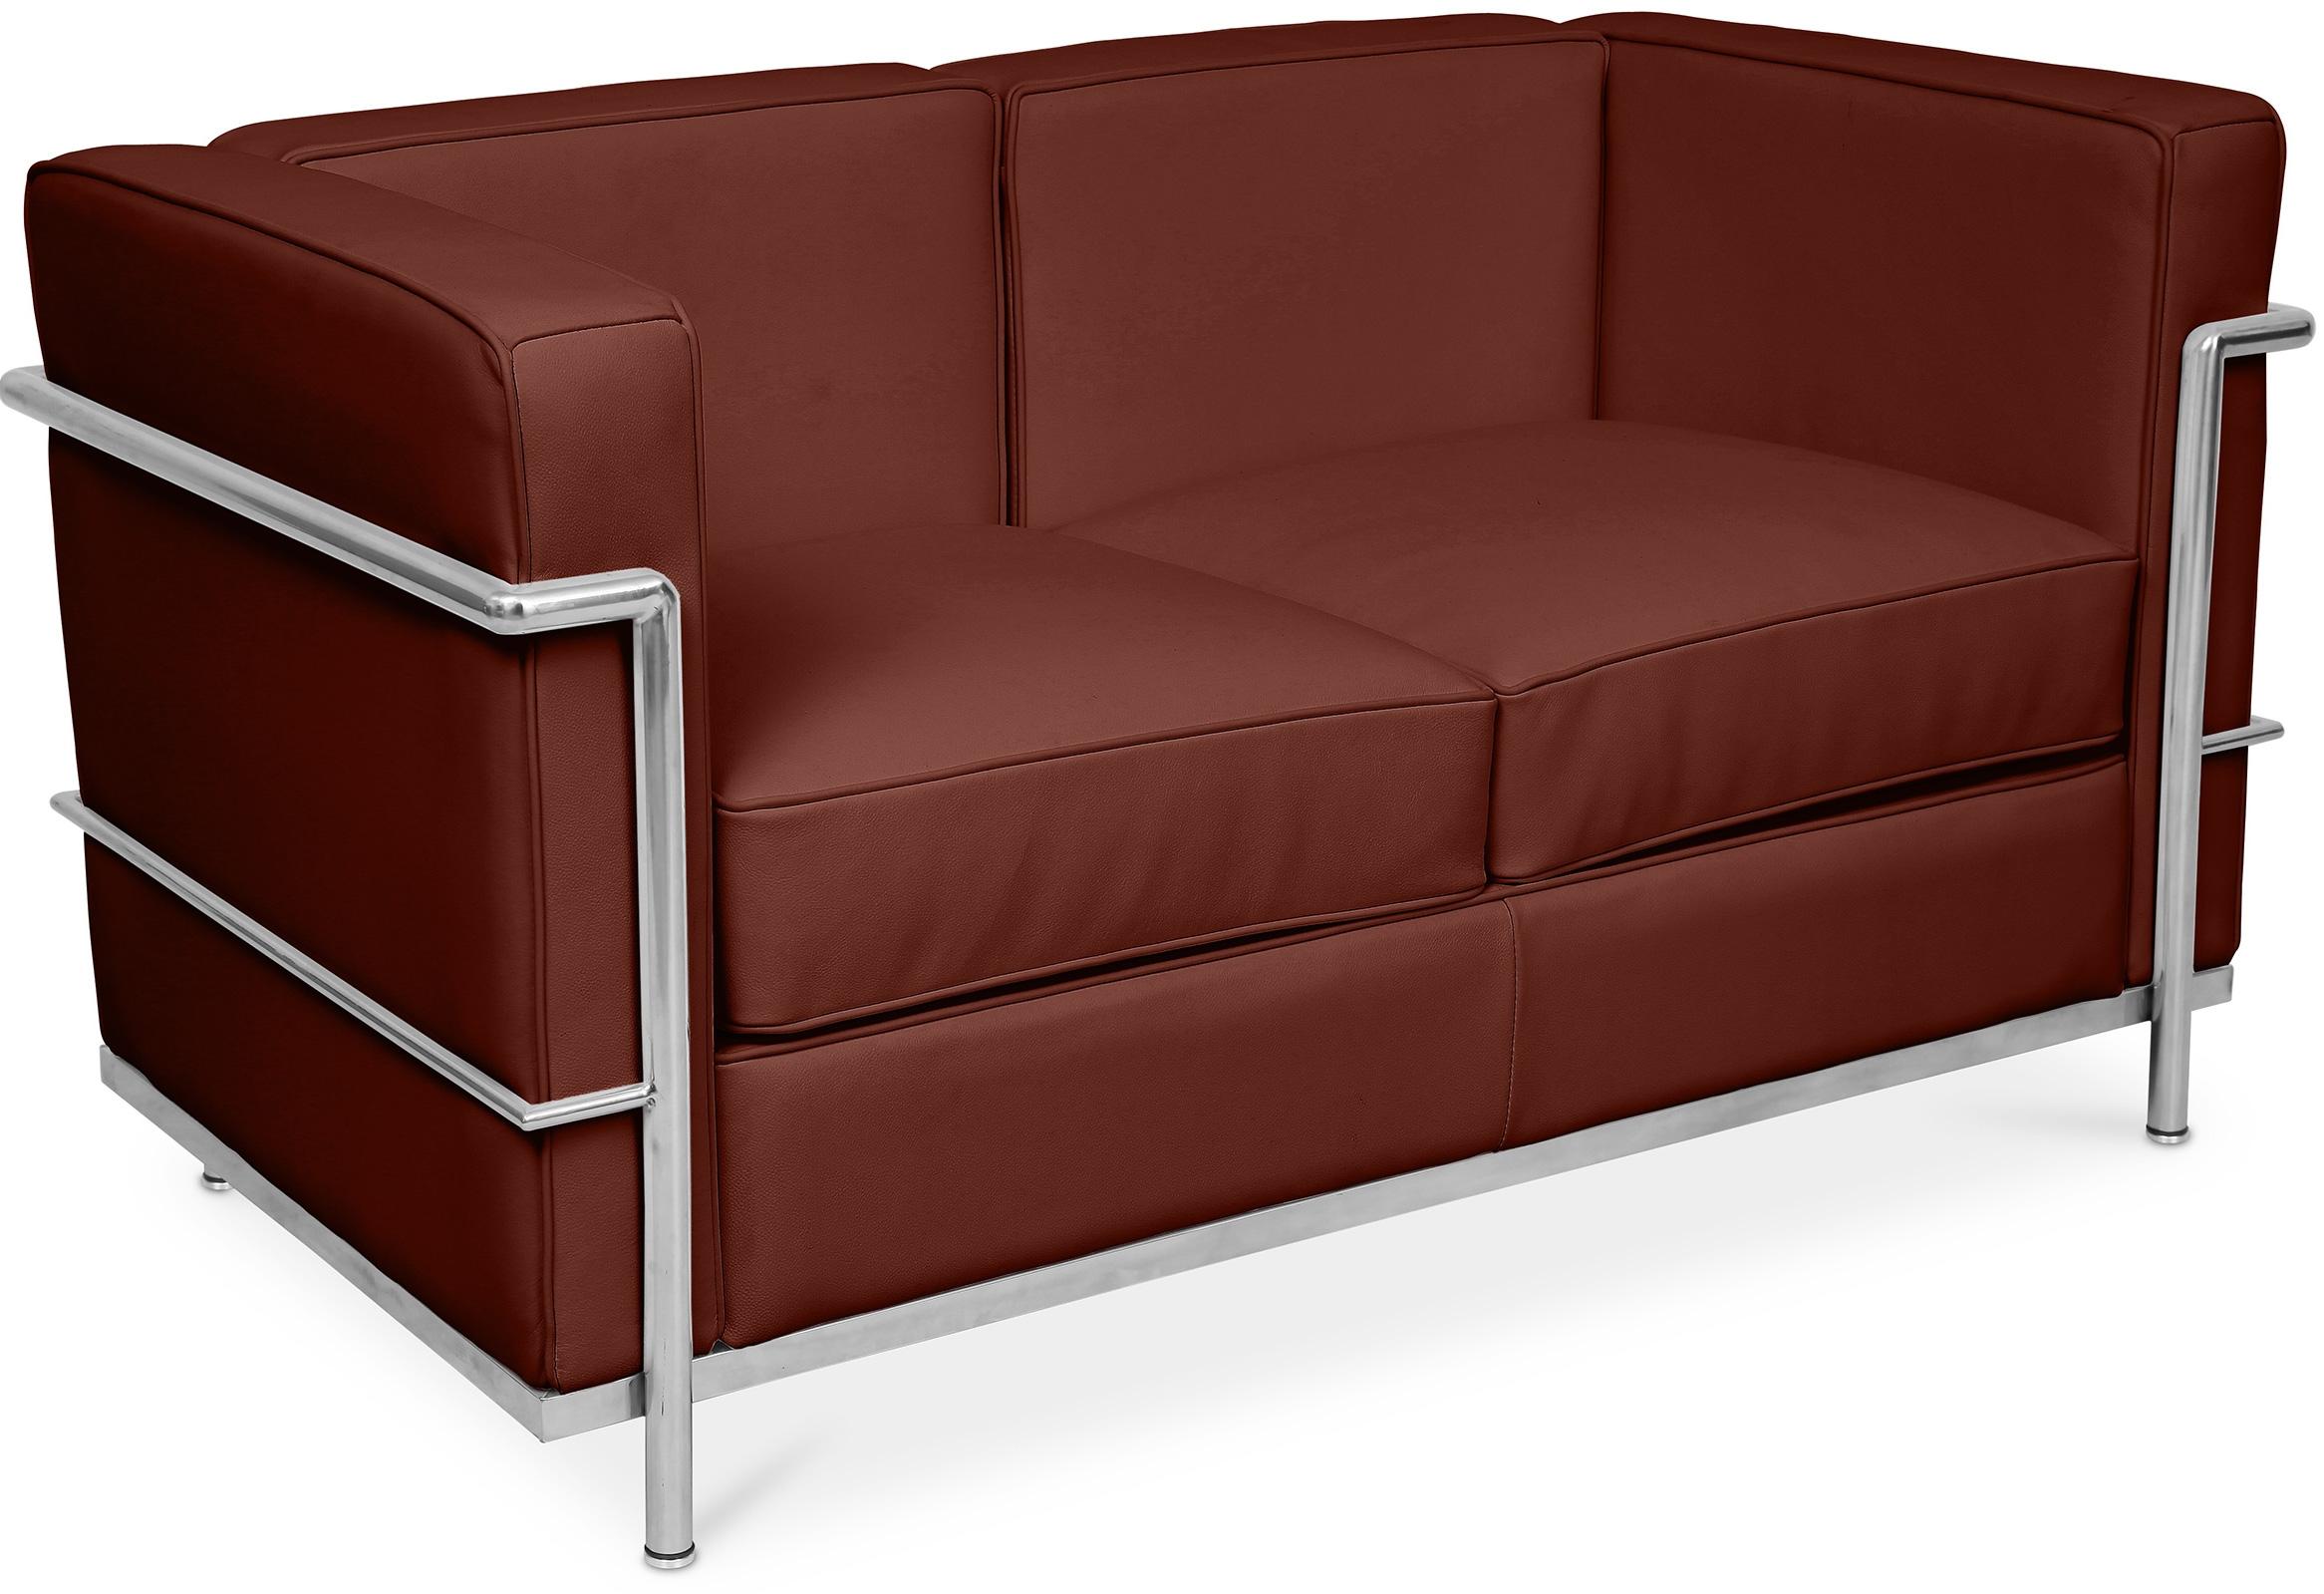 canap cuir marron 2 places l 132 inspir lc2. Black Bedroom Furniture Sets. Home Design Ideas